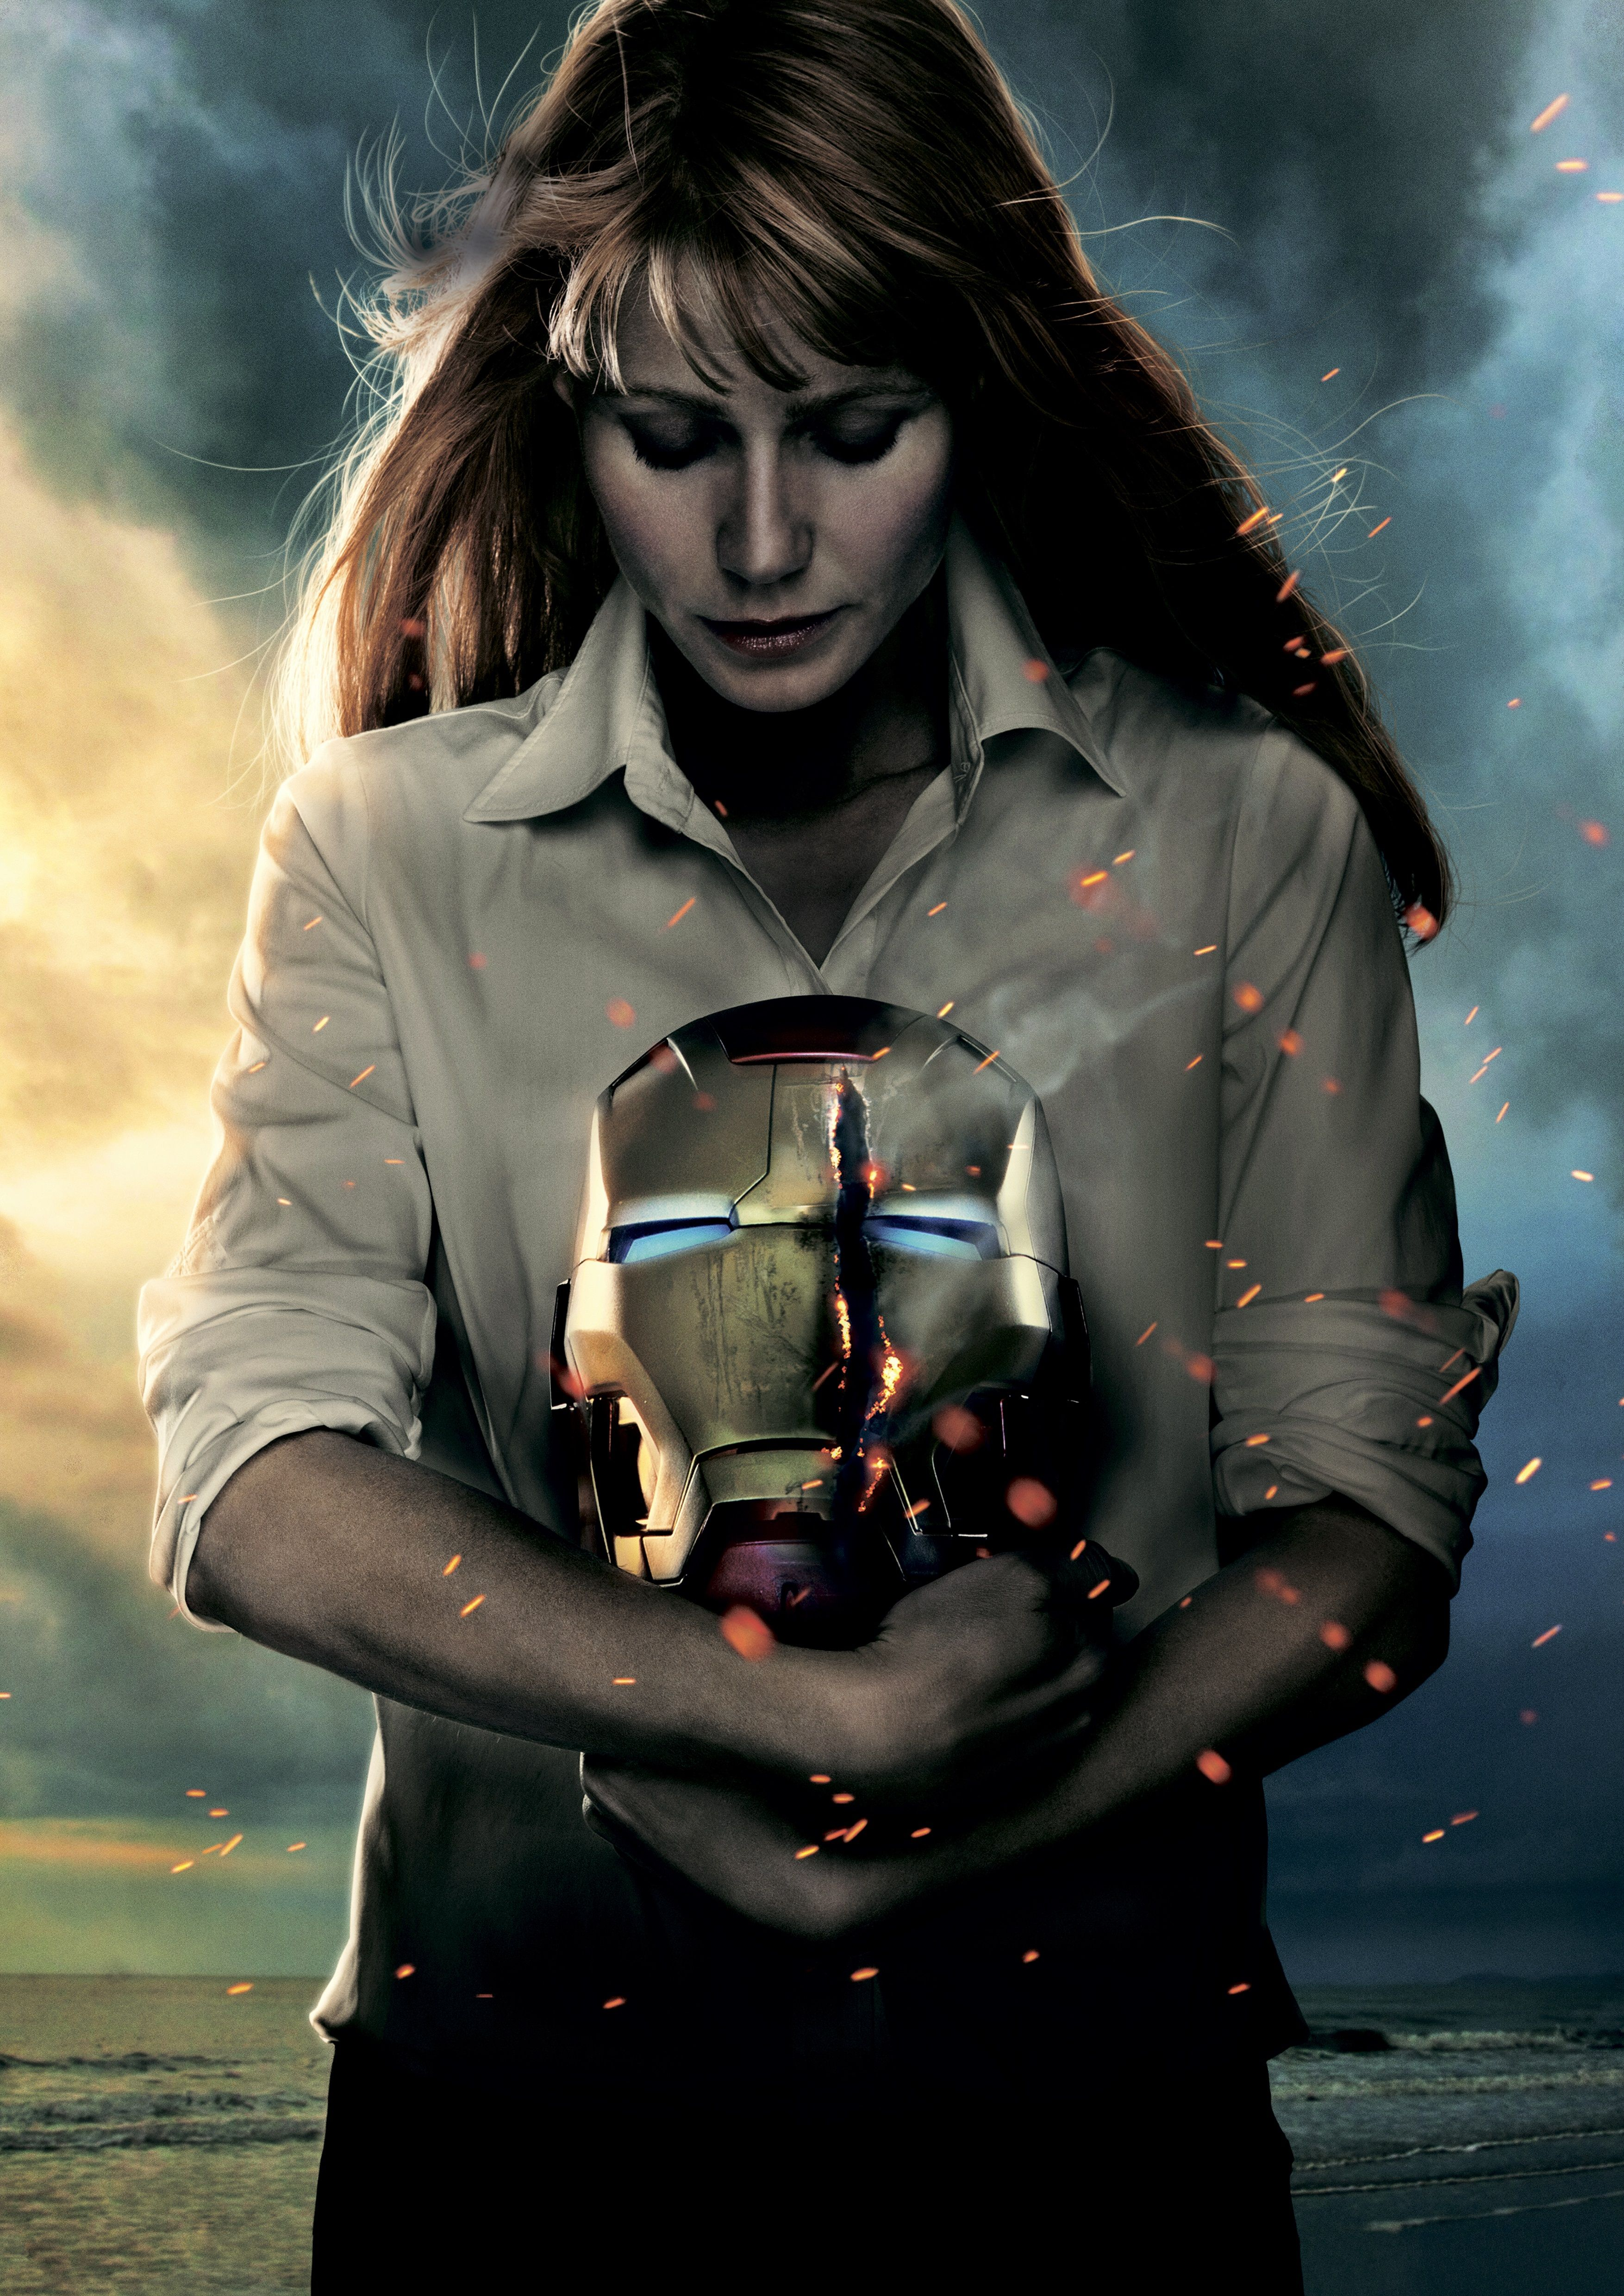 iron man 3 textless movie poster marvelcast �� pinterest